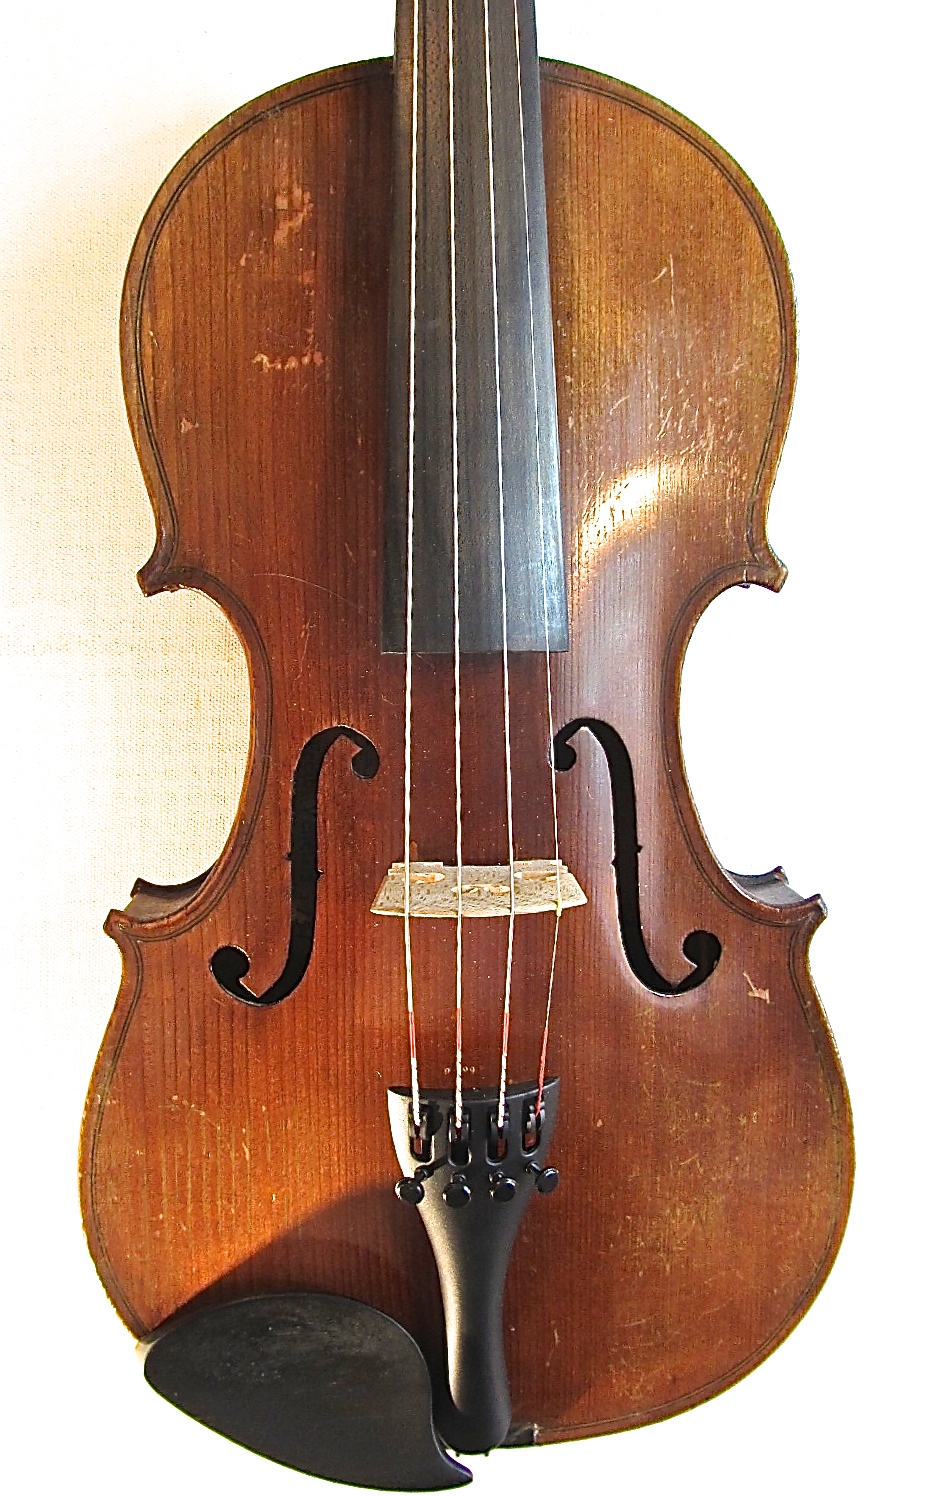 new vintage french german violins for sale galway clare ireland under 1000. Black Bedroom Furniture Sets. Home Design Ideas